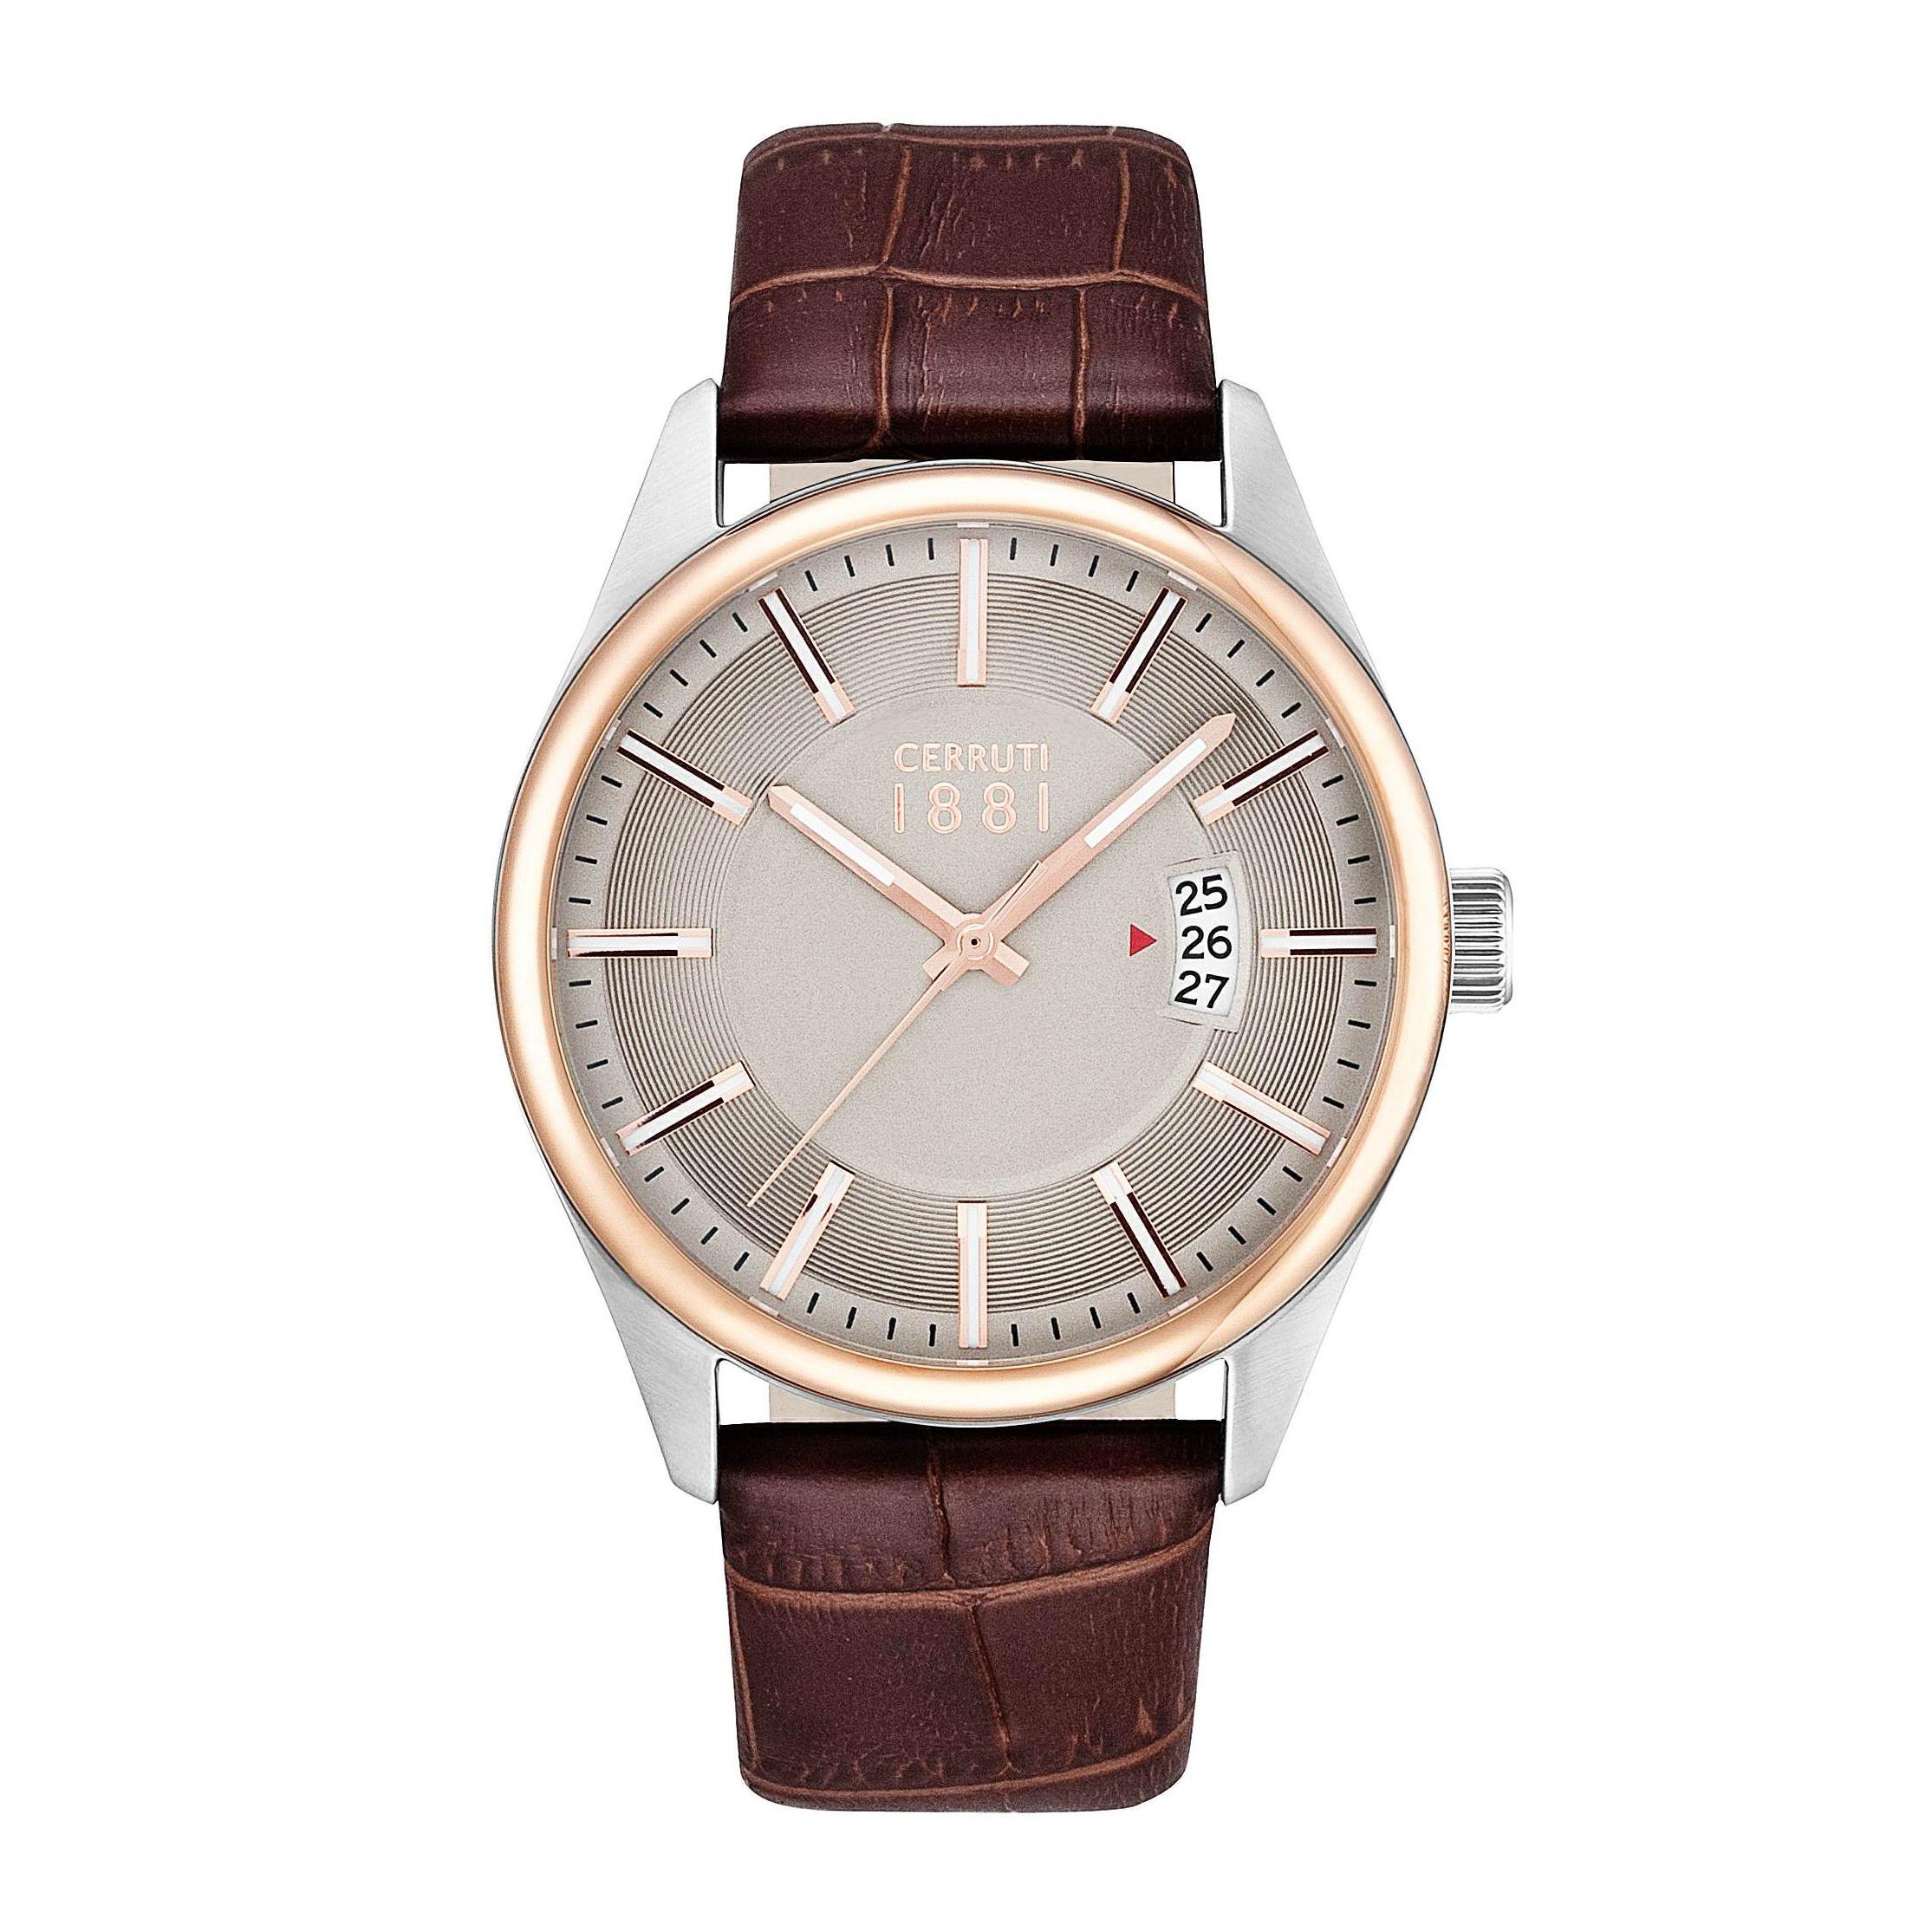 orologio Cerruti uomo  CRA127STR20BR mod Palinuro